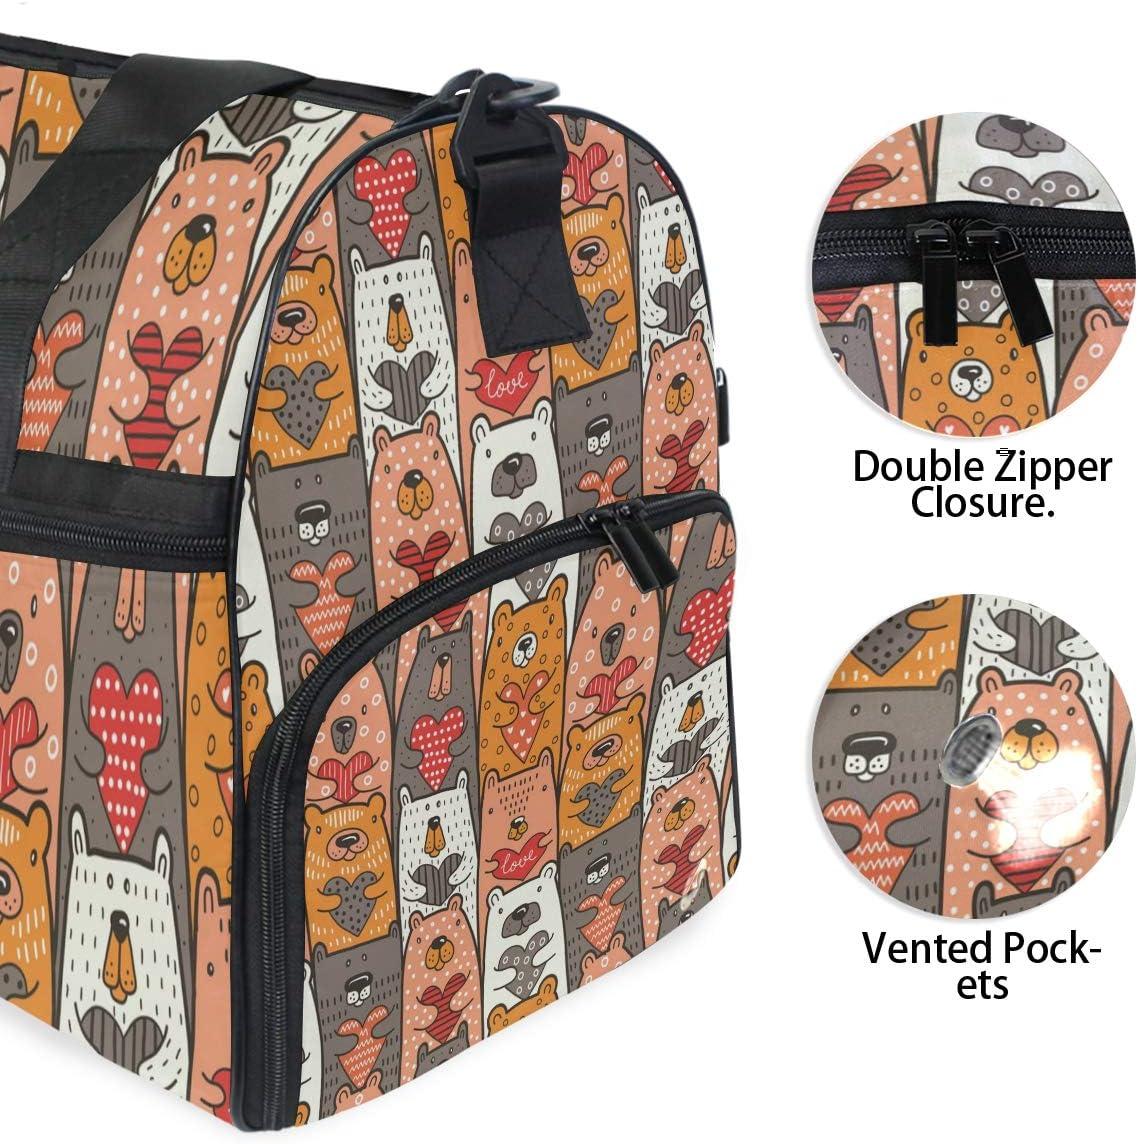 FANTAZIO Cartoon Bear Holding Heart Sports Duffle Bag Gym Bag Travel Duffel with Adjustable Strap